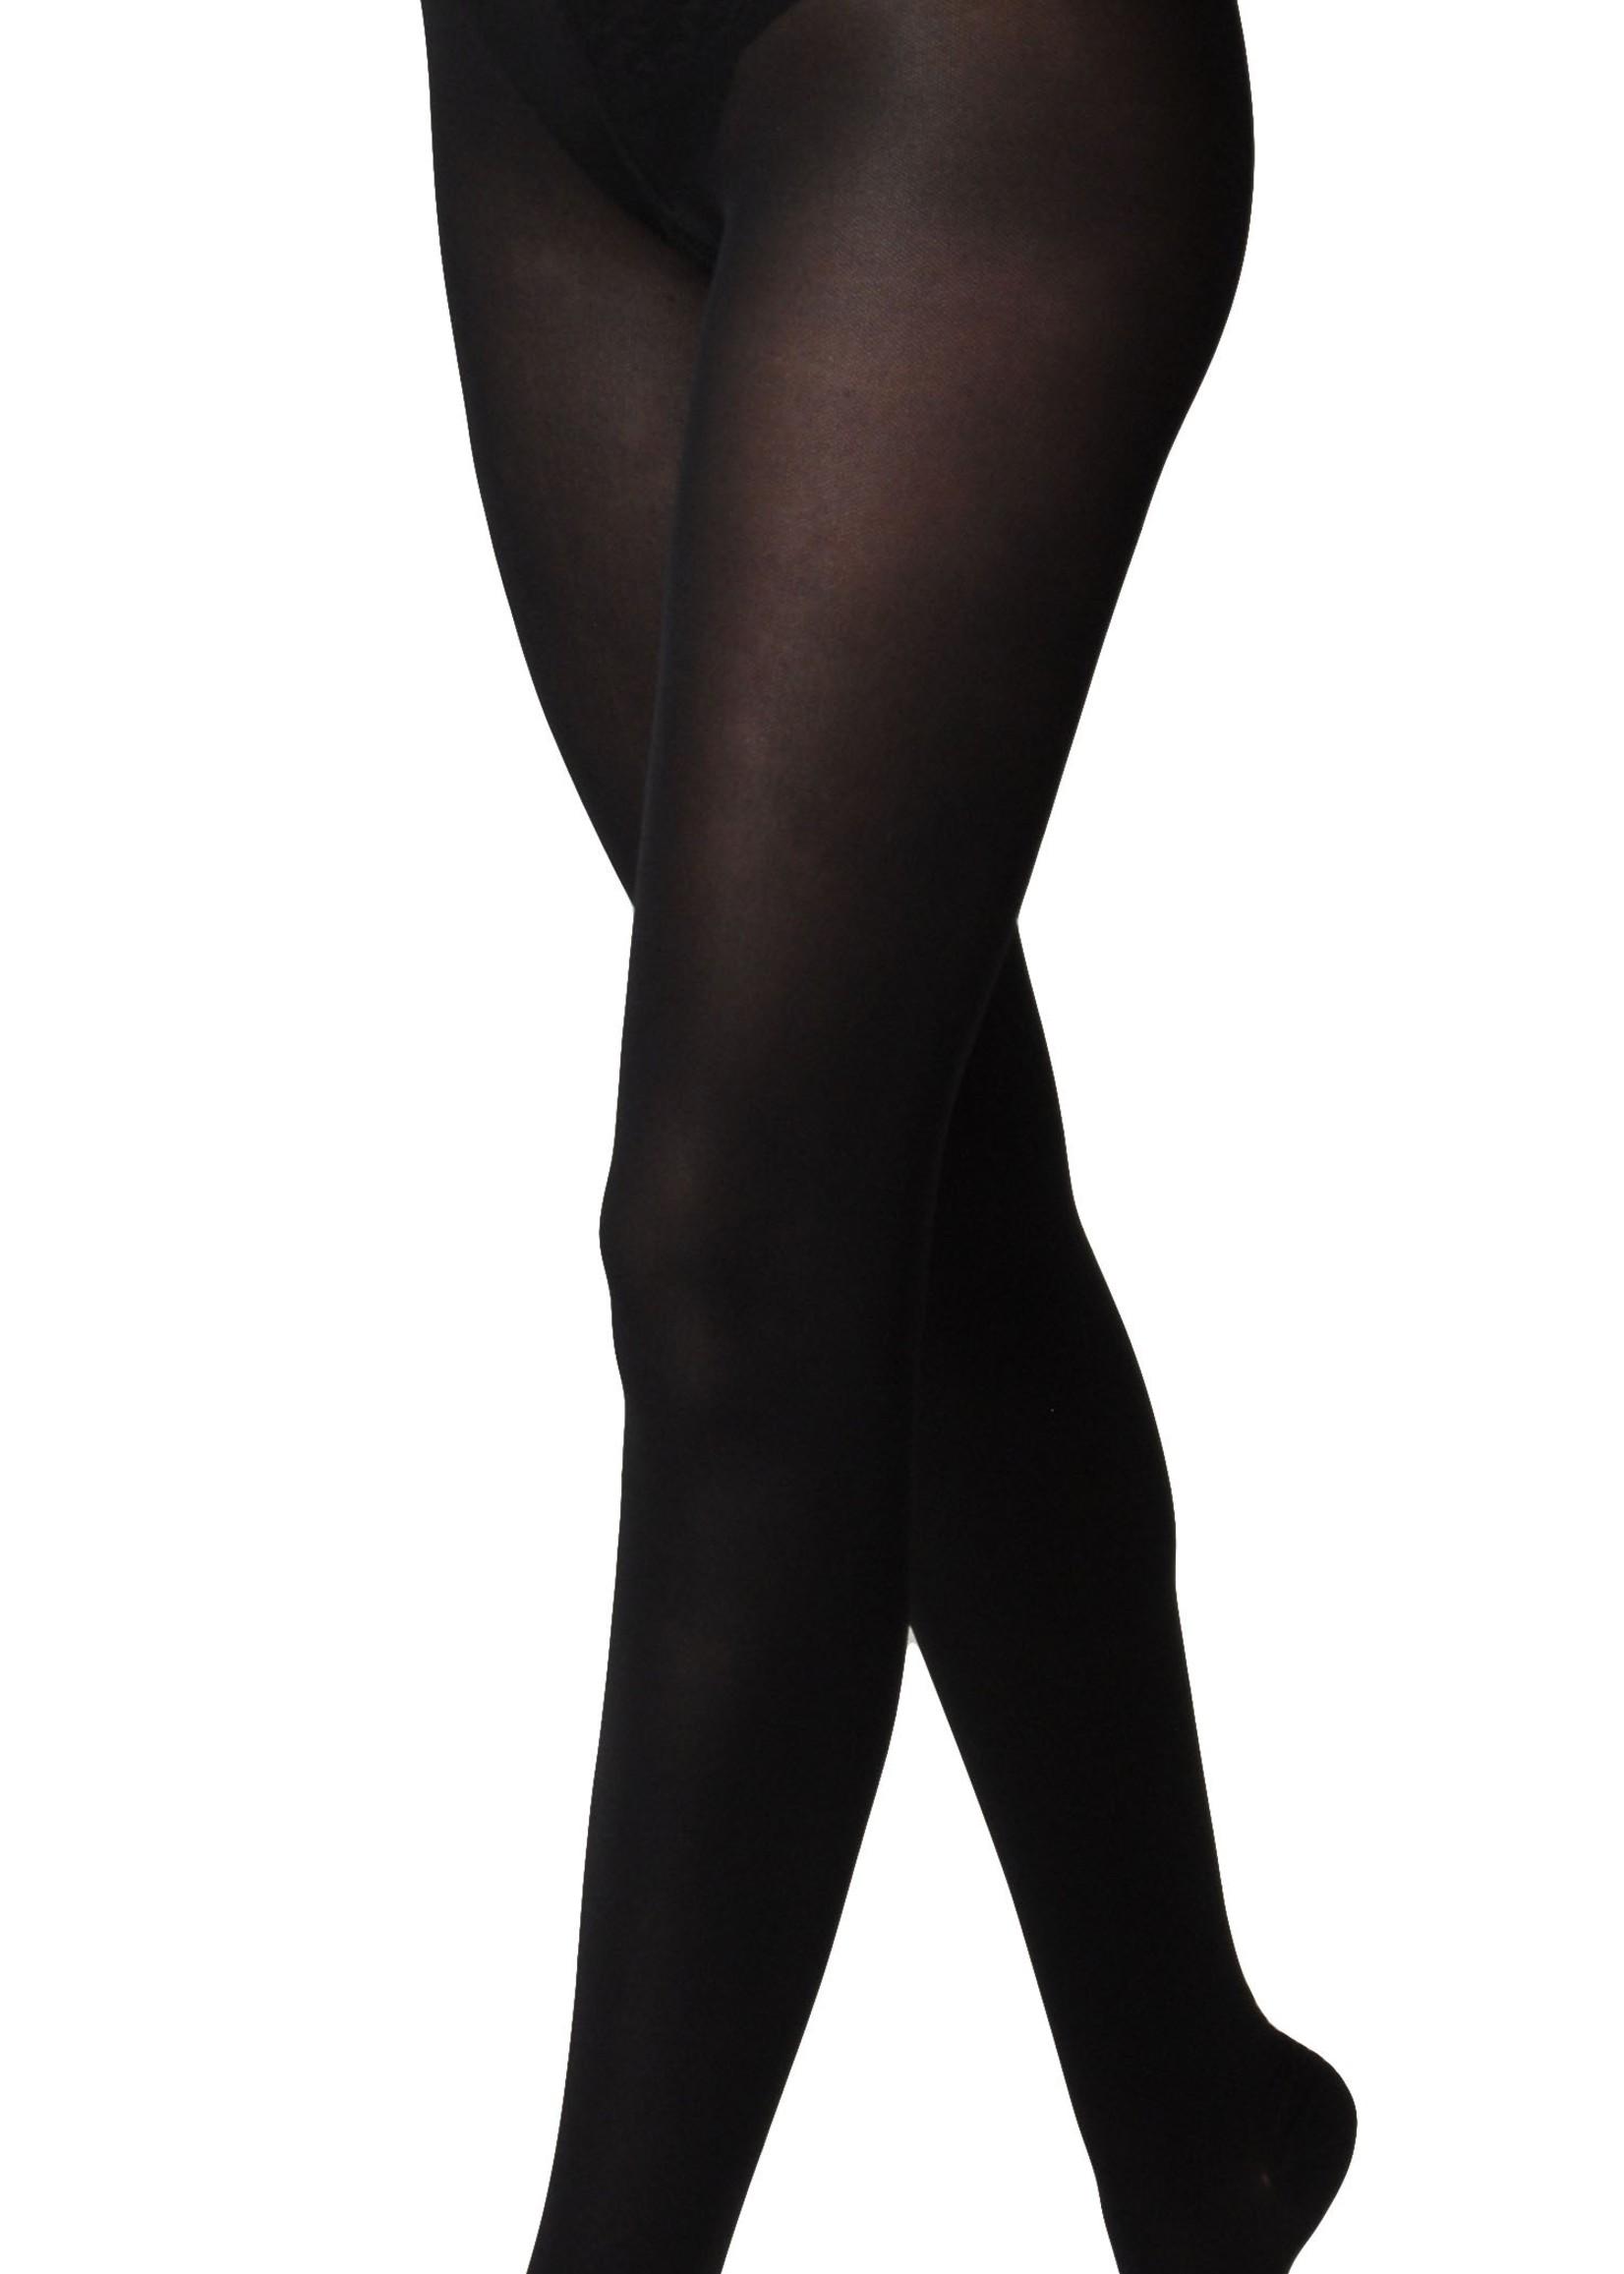 Segretta Segretta Young Coprente 70 Matte Opaque Panty met medium compressie - Black